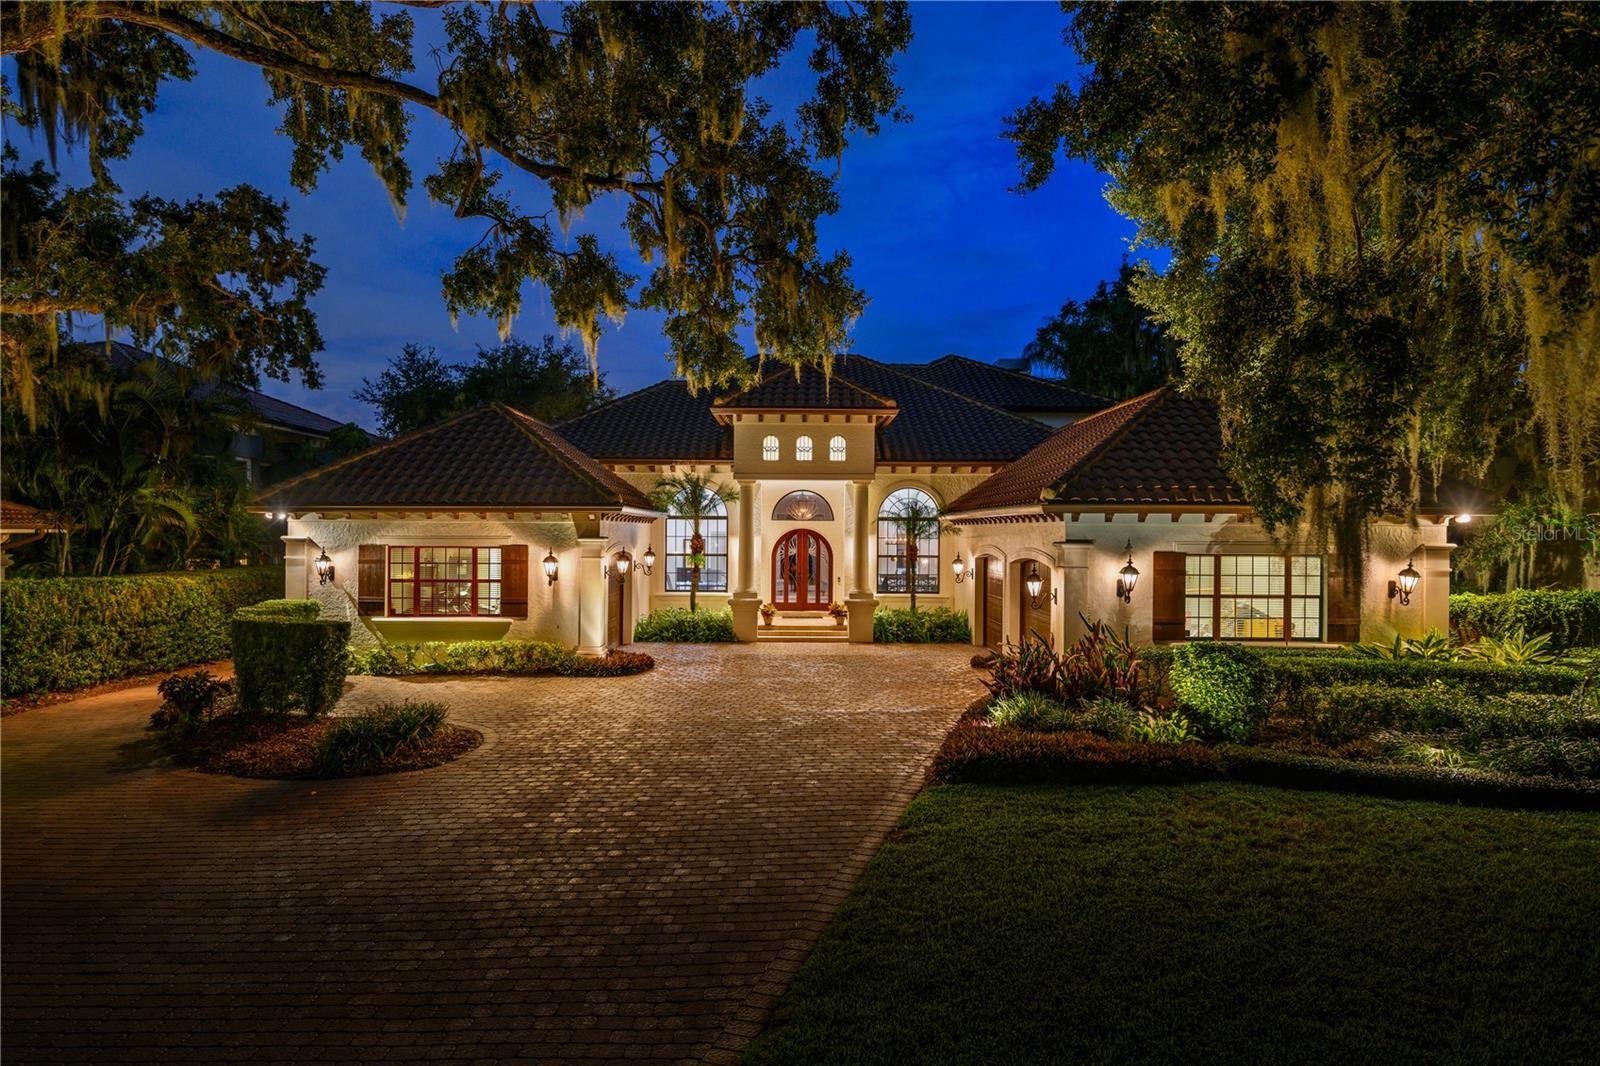 Photo of 802 W 2ND AVENUE, WINDERMERE, FL 34786 (MLS # O5971407)